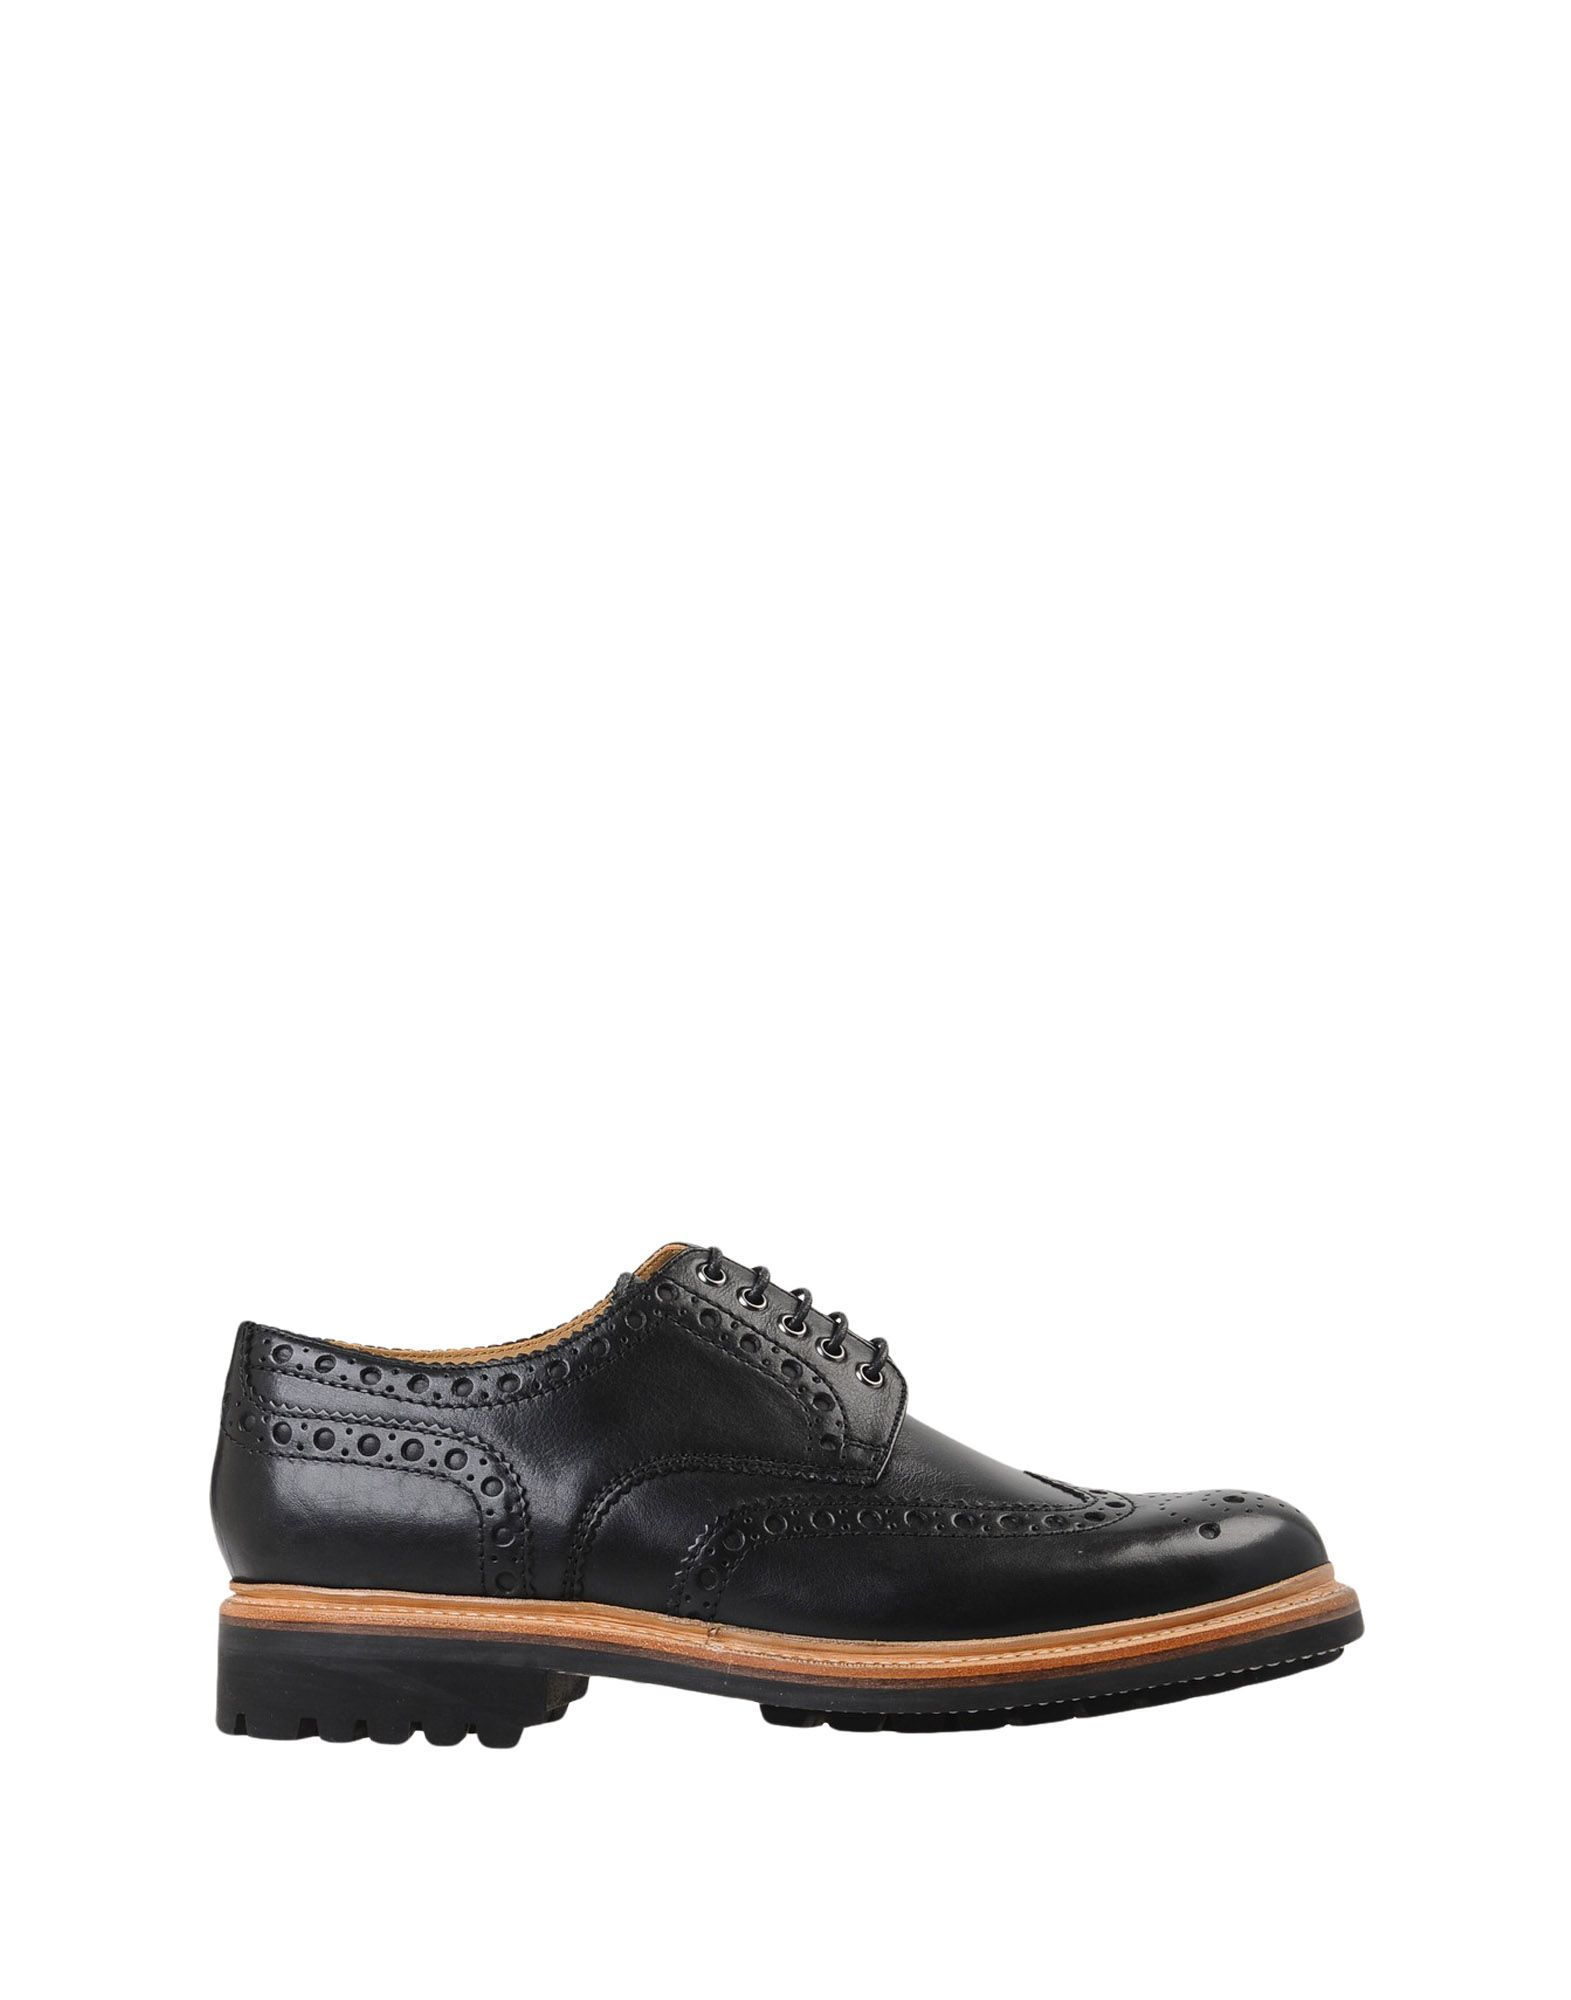 Grenson Archie Commando  11466735OL Schuhe Gute Qualität beliebte Schuhe 11466735OL d01faf